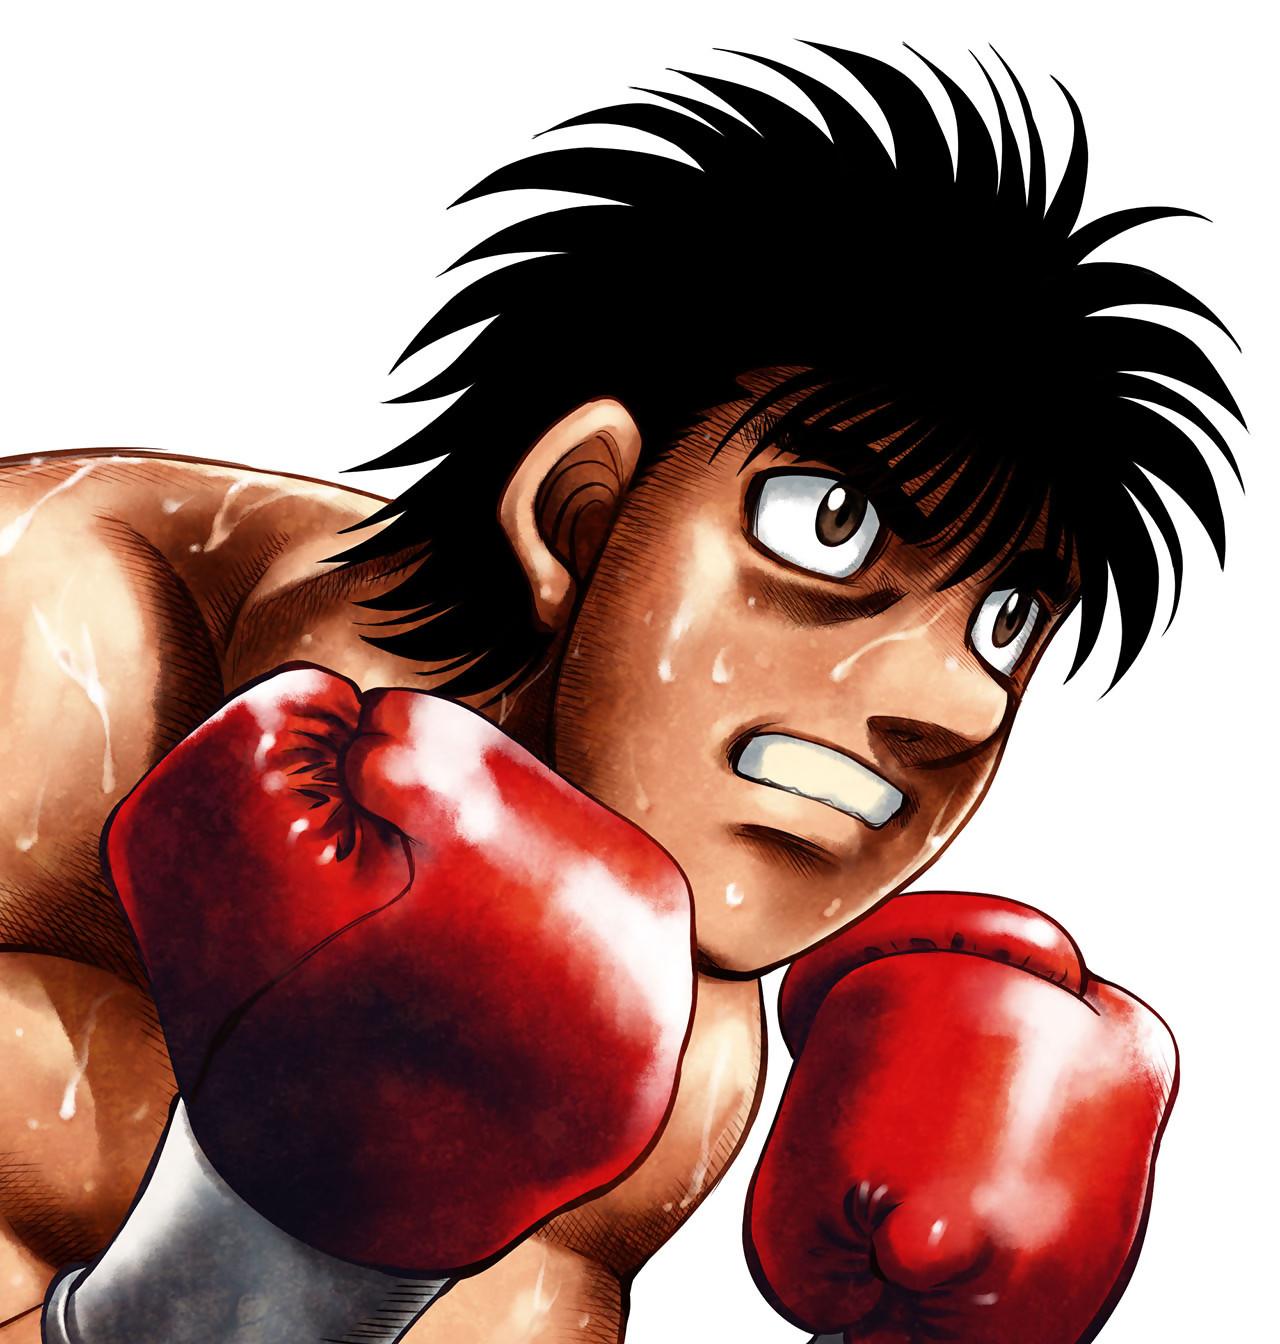 Hajime No Ippo News: Images Hajime No Ippo : The Fighting